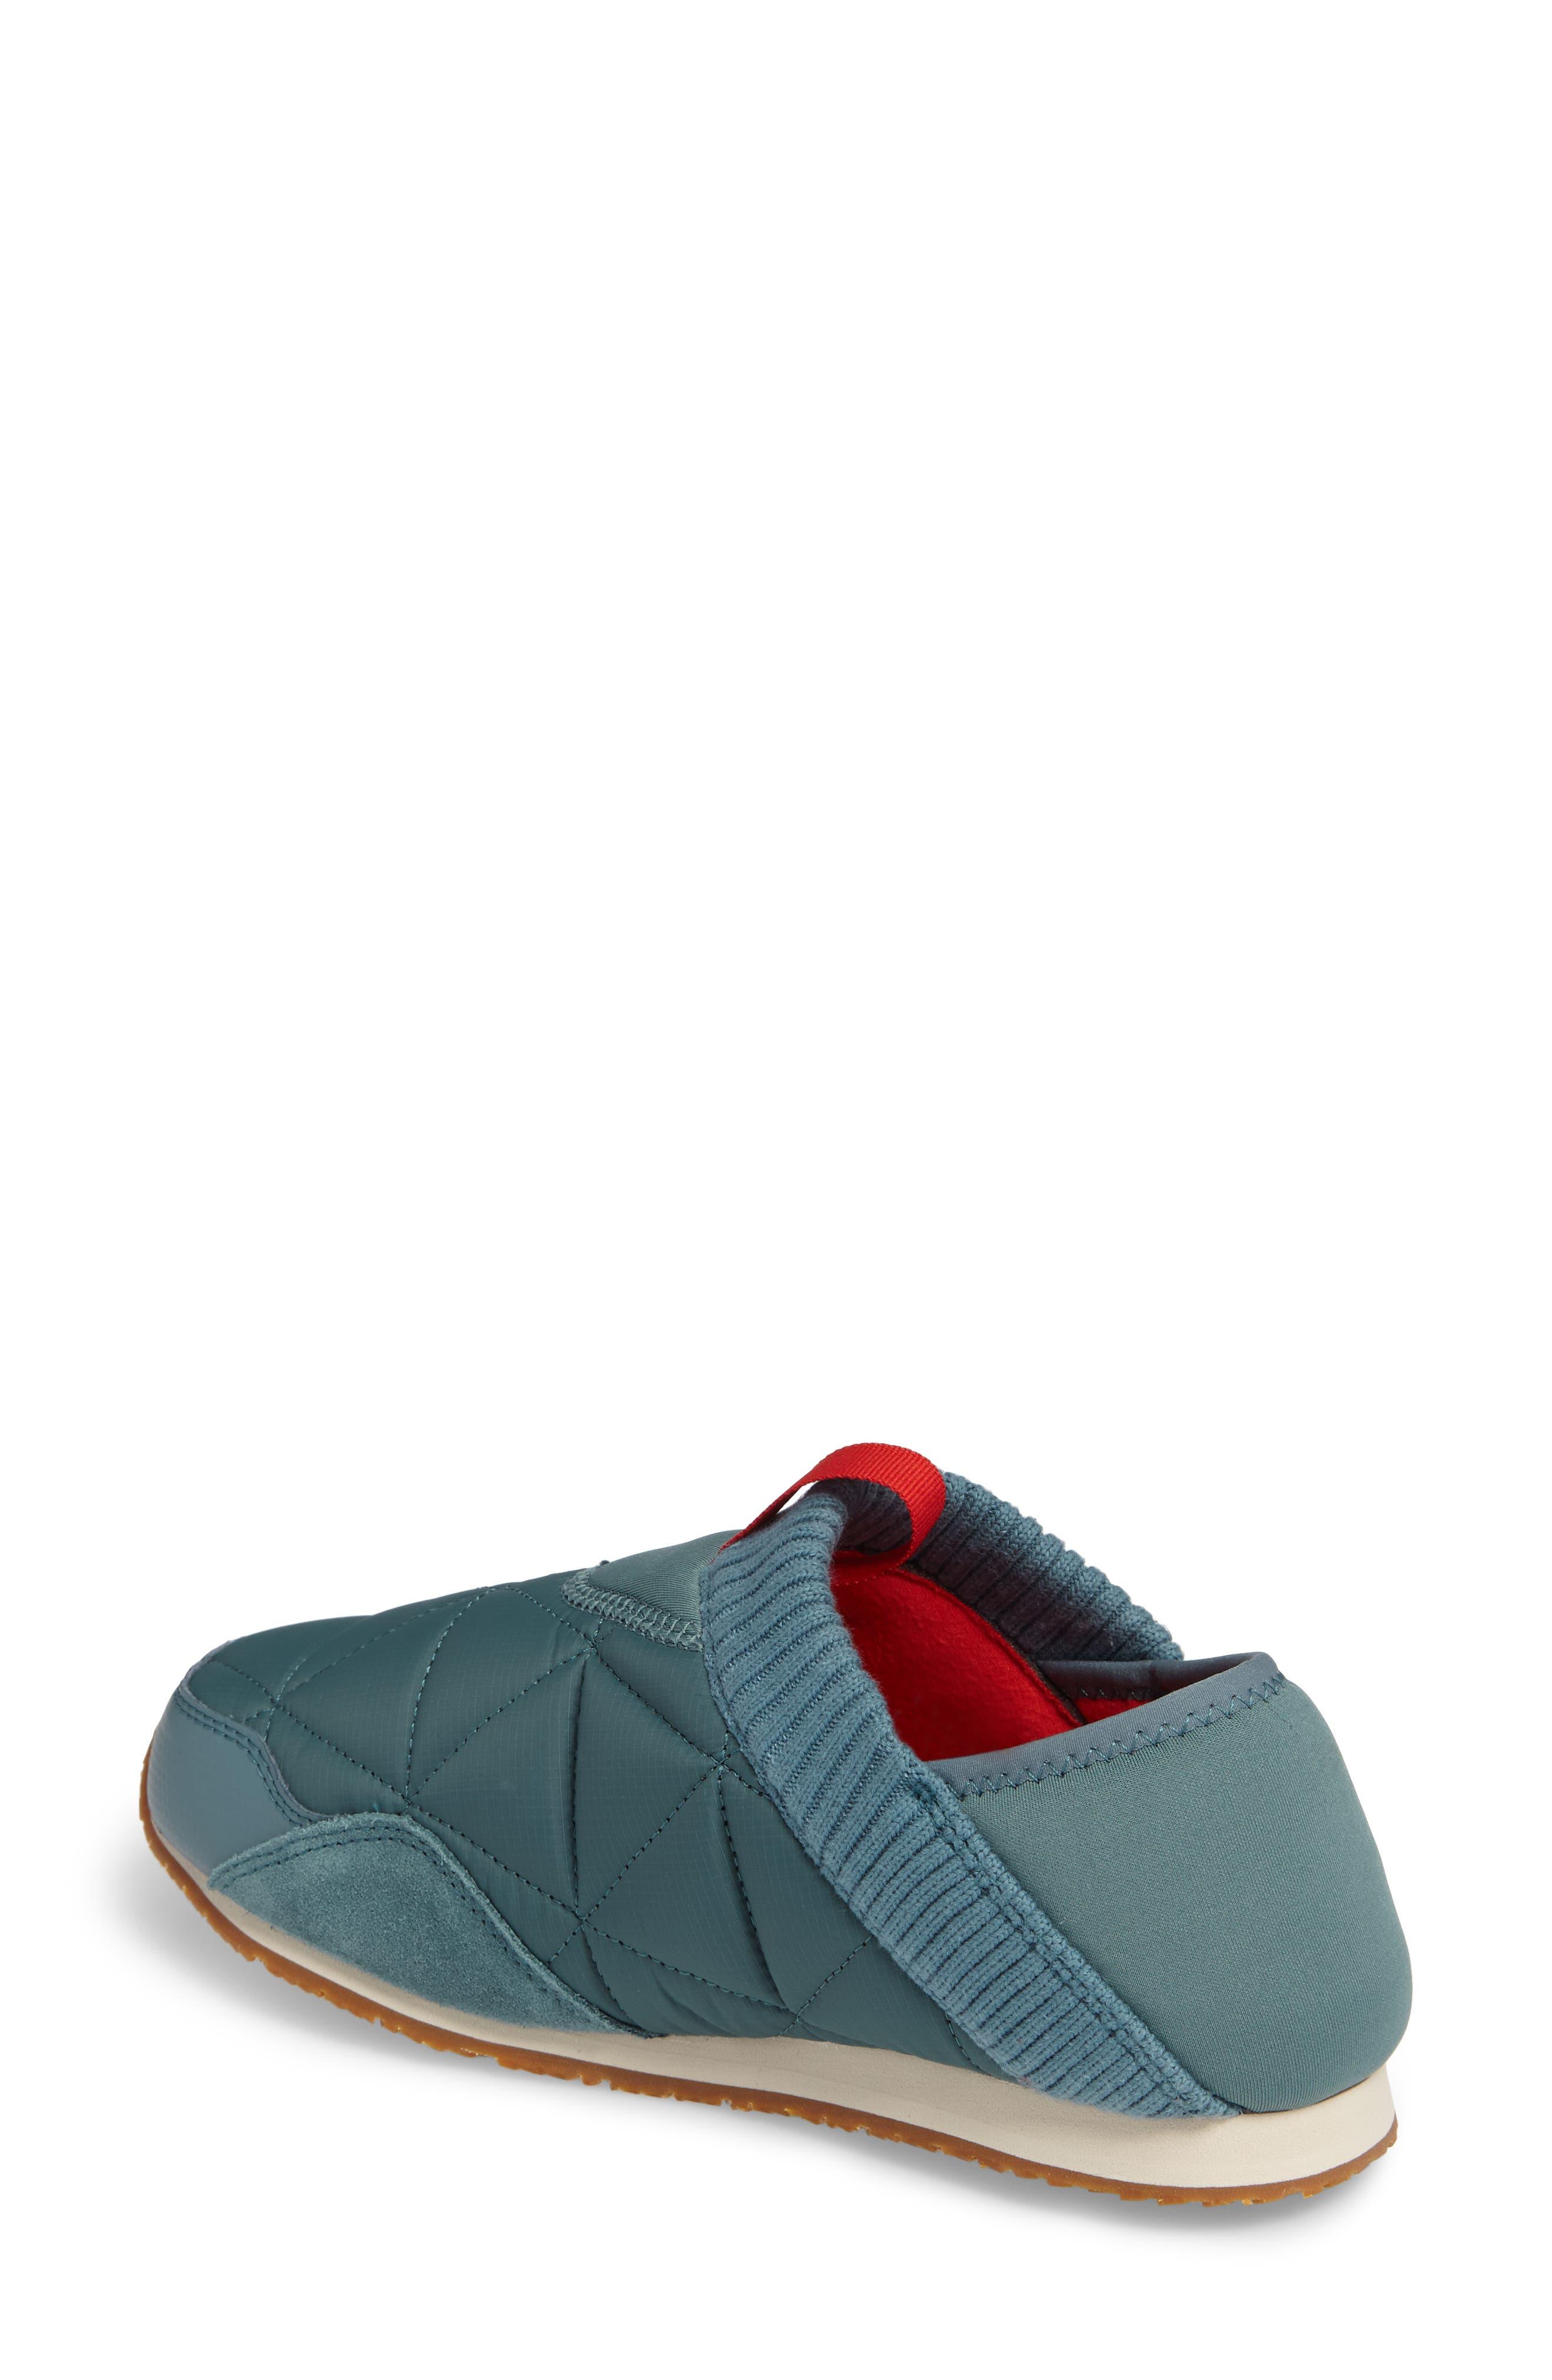 Ember Convertible Slip-On,                             Alternate thumbnail 2, color,                             North Atlantic Fabric